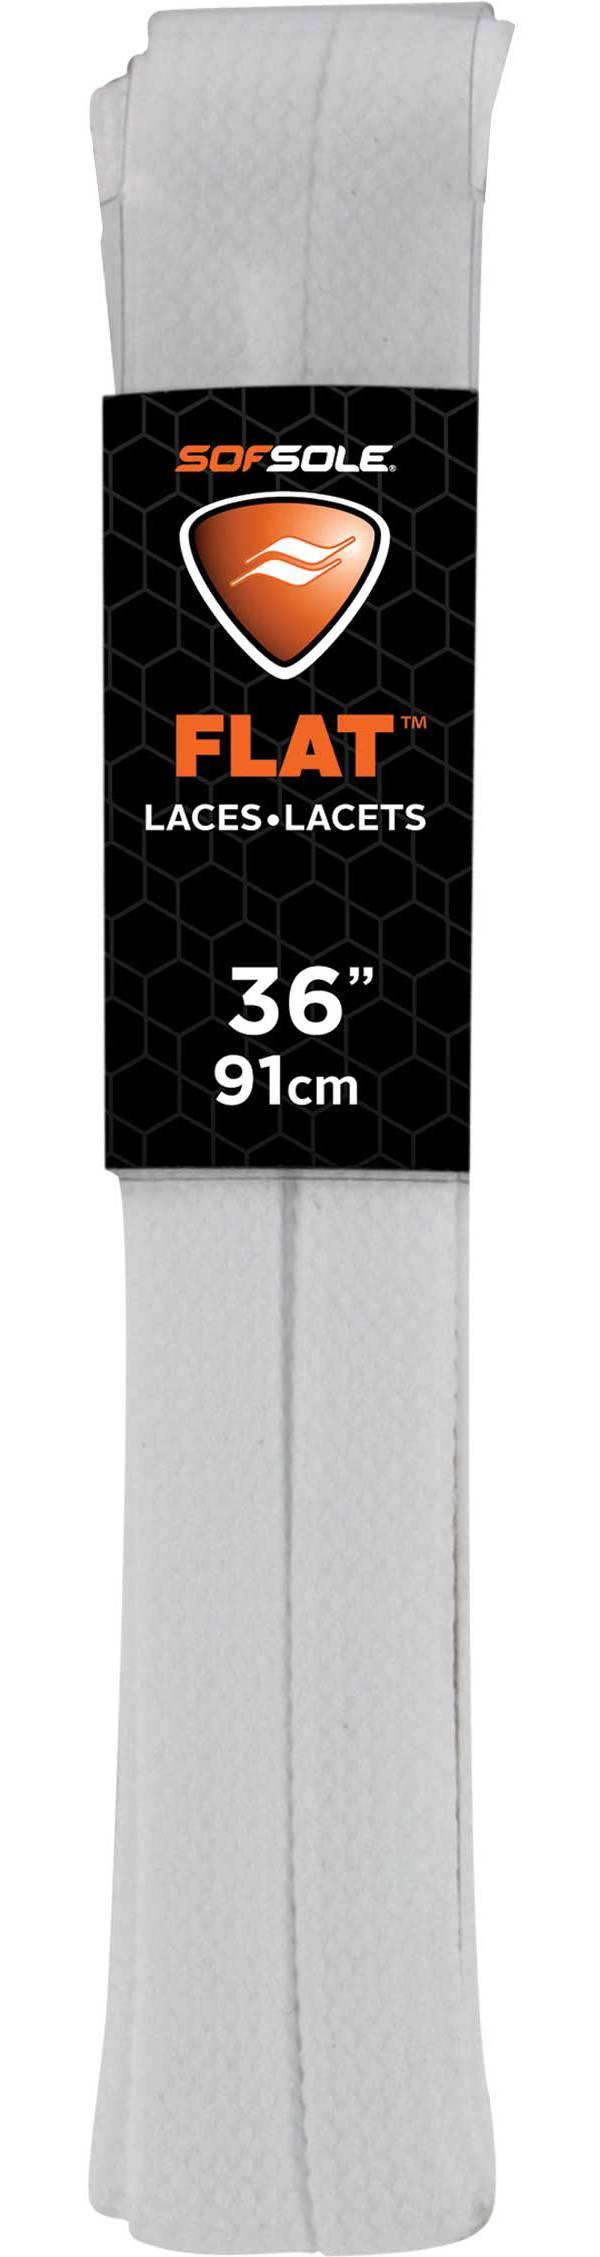 "Sof Sole 36"" Flat Shoe Laces product image"